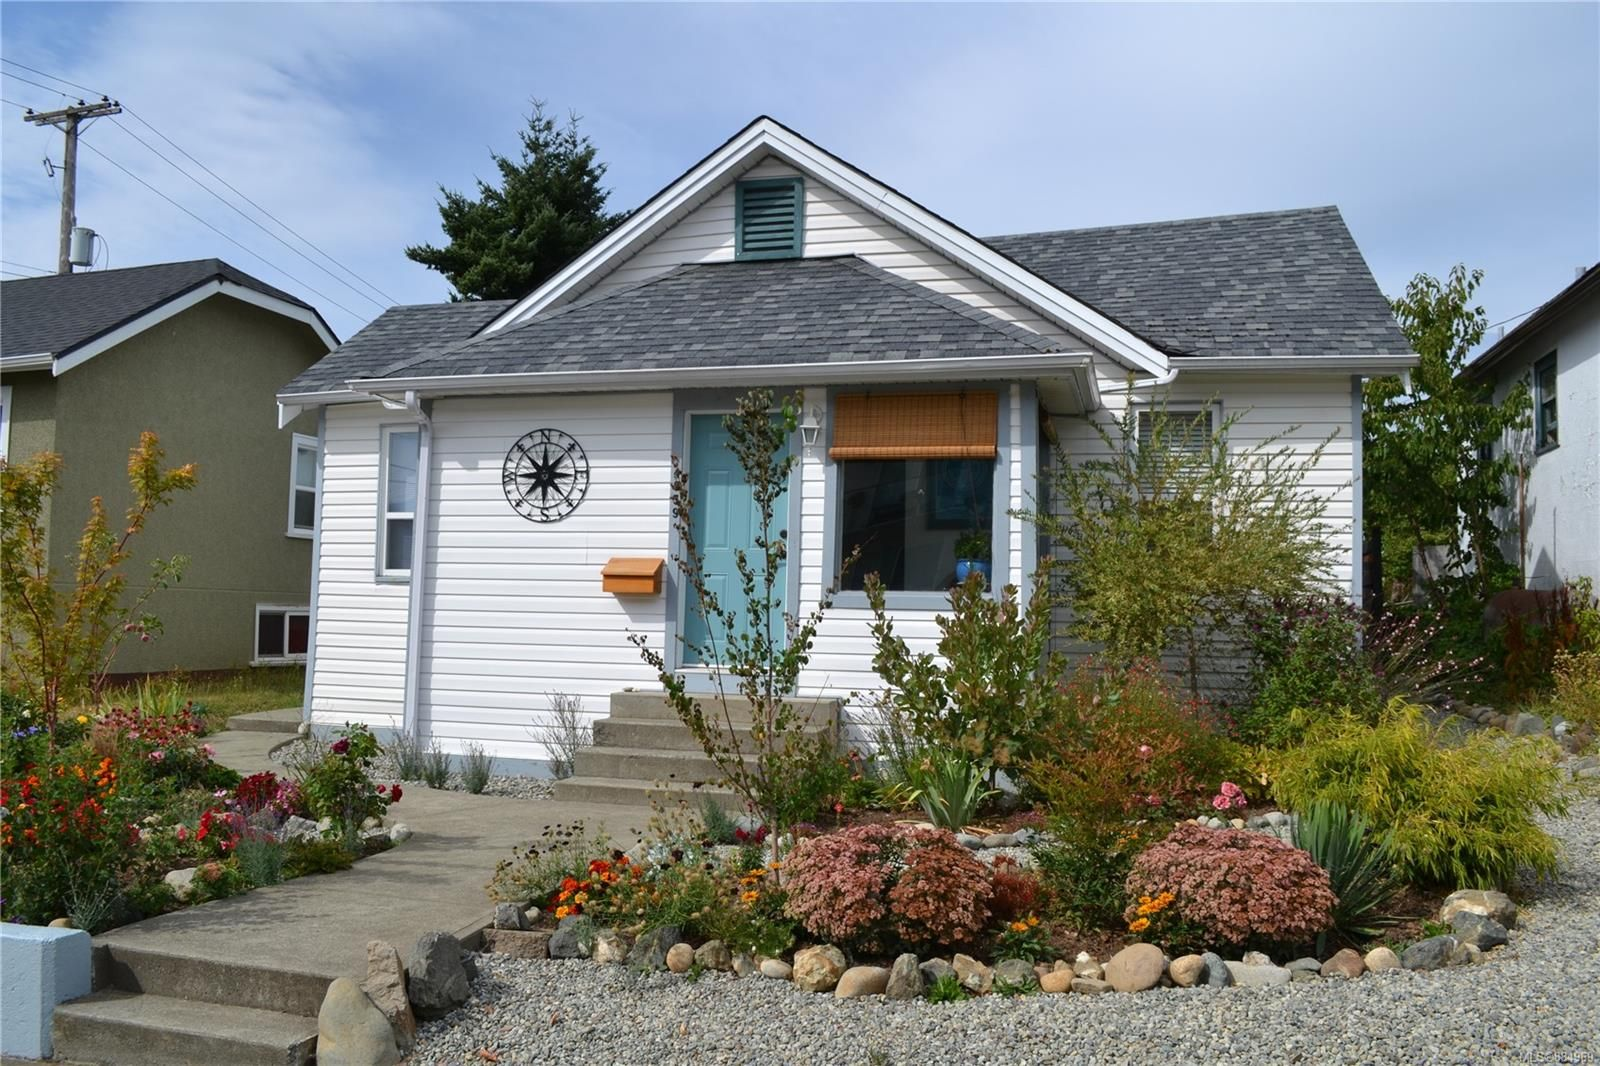 Main Photo: 4939 Athol St in : PA Port Alberni House for sale (Port Alberni)  : MLS®# 884969